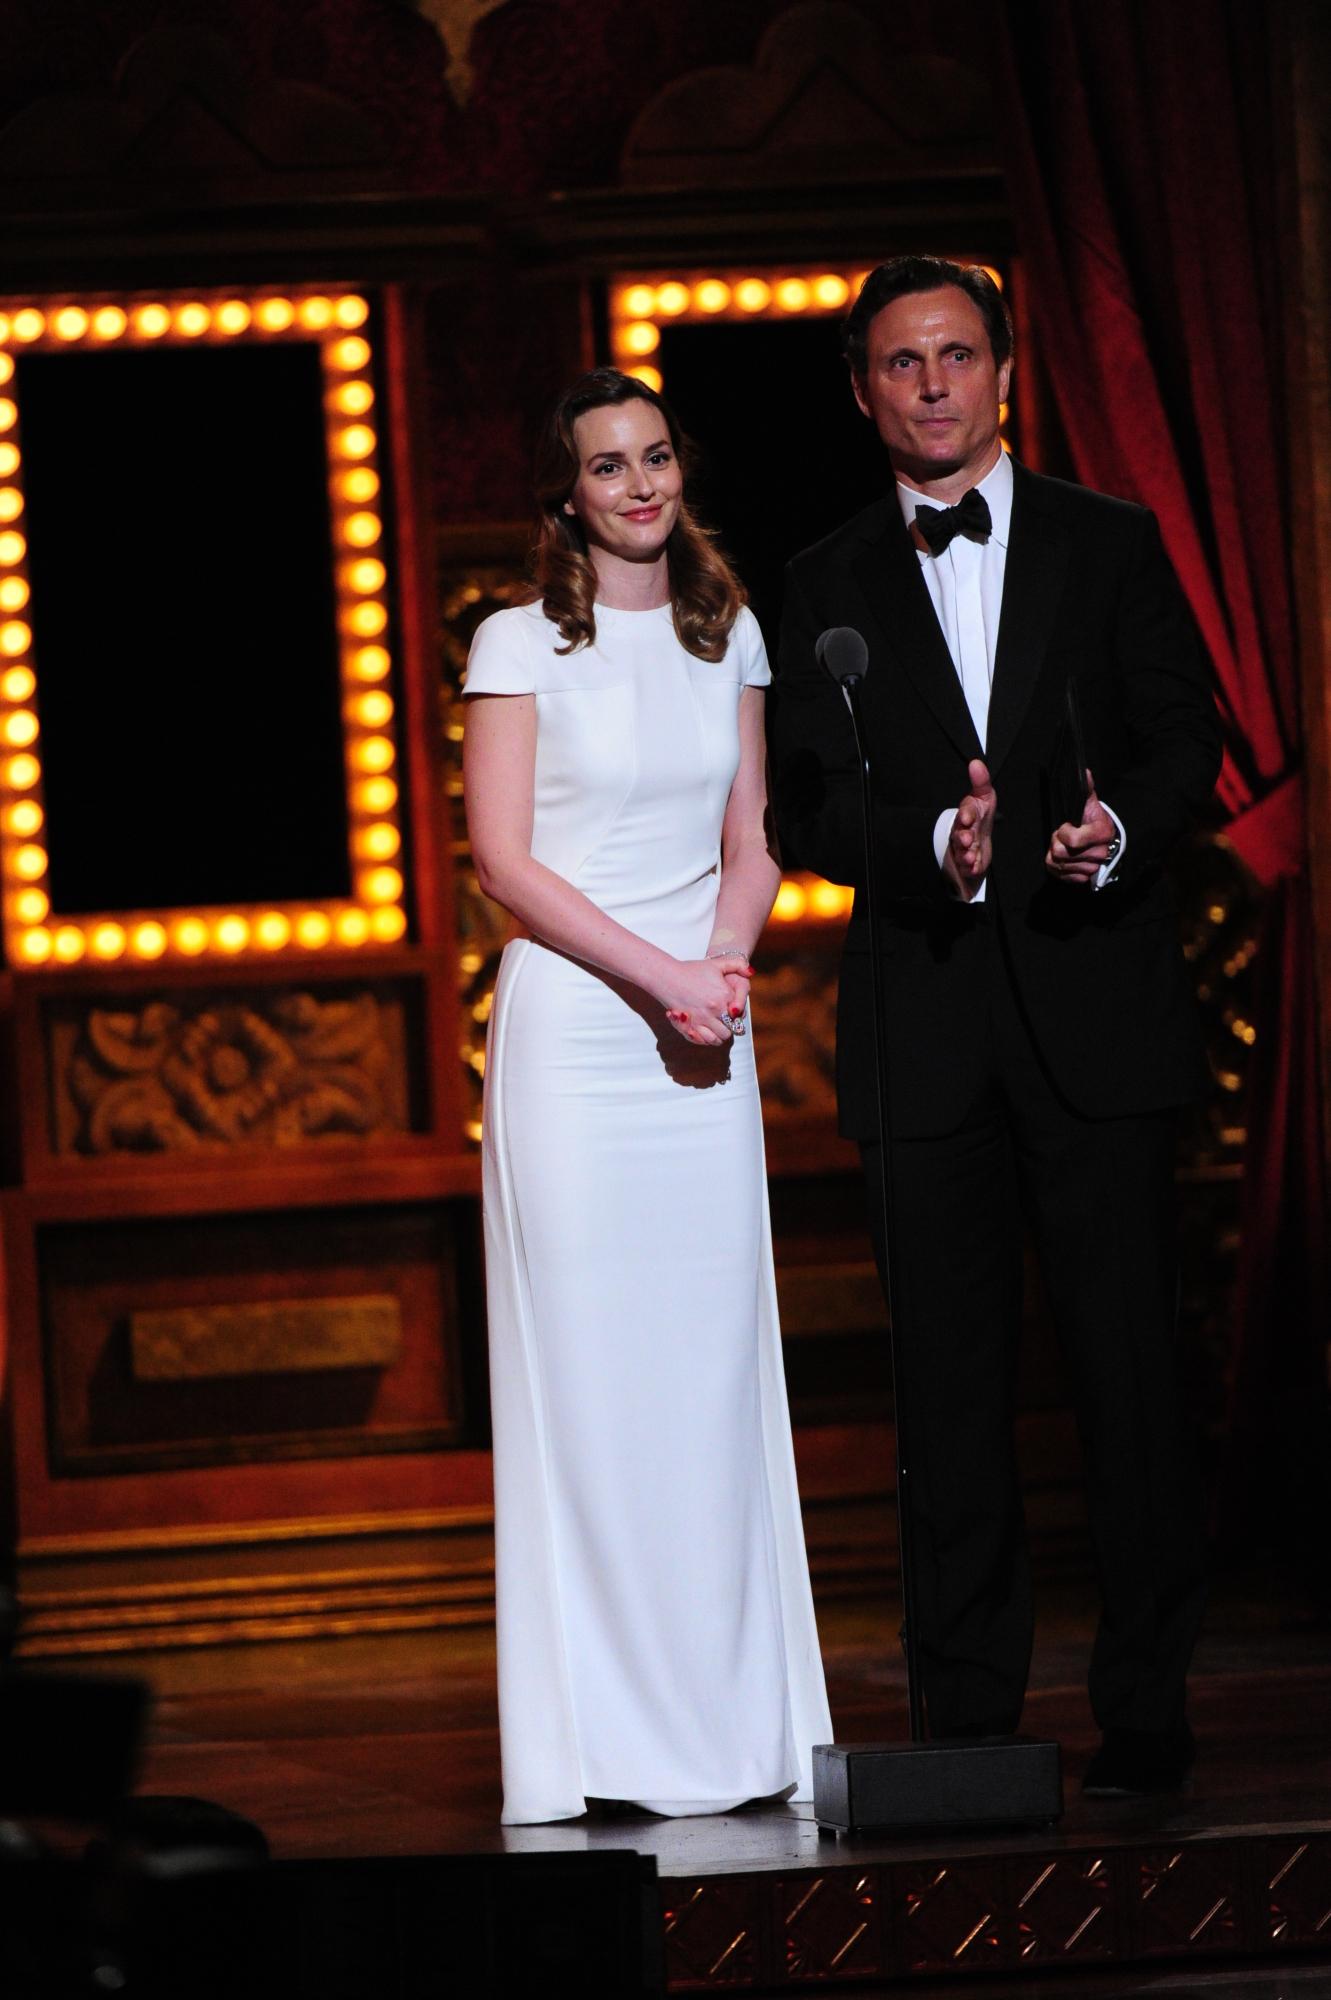 Leighton Meester and Tony Goldwyn - 2014 Tony Awards